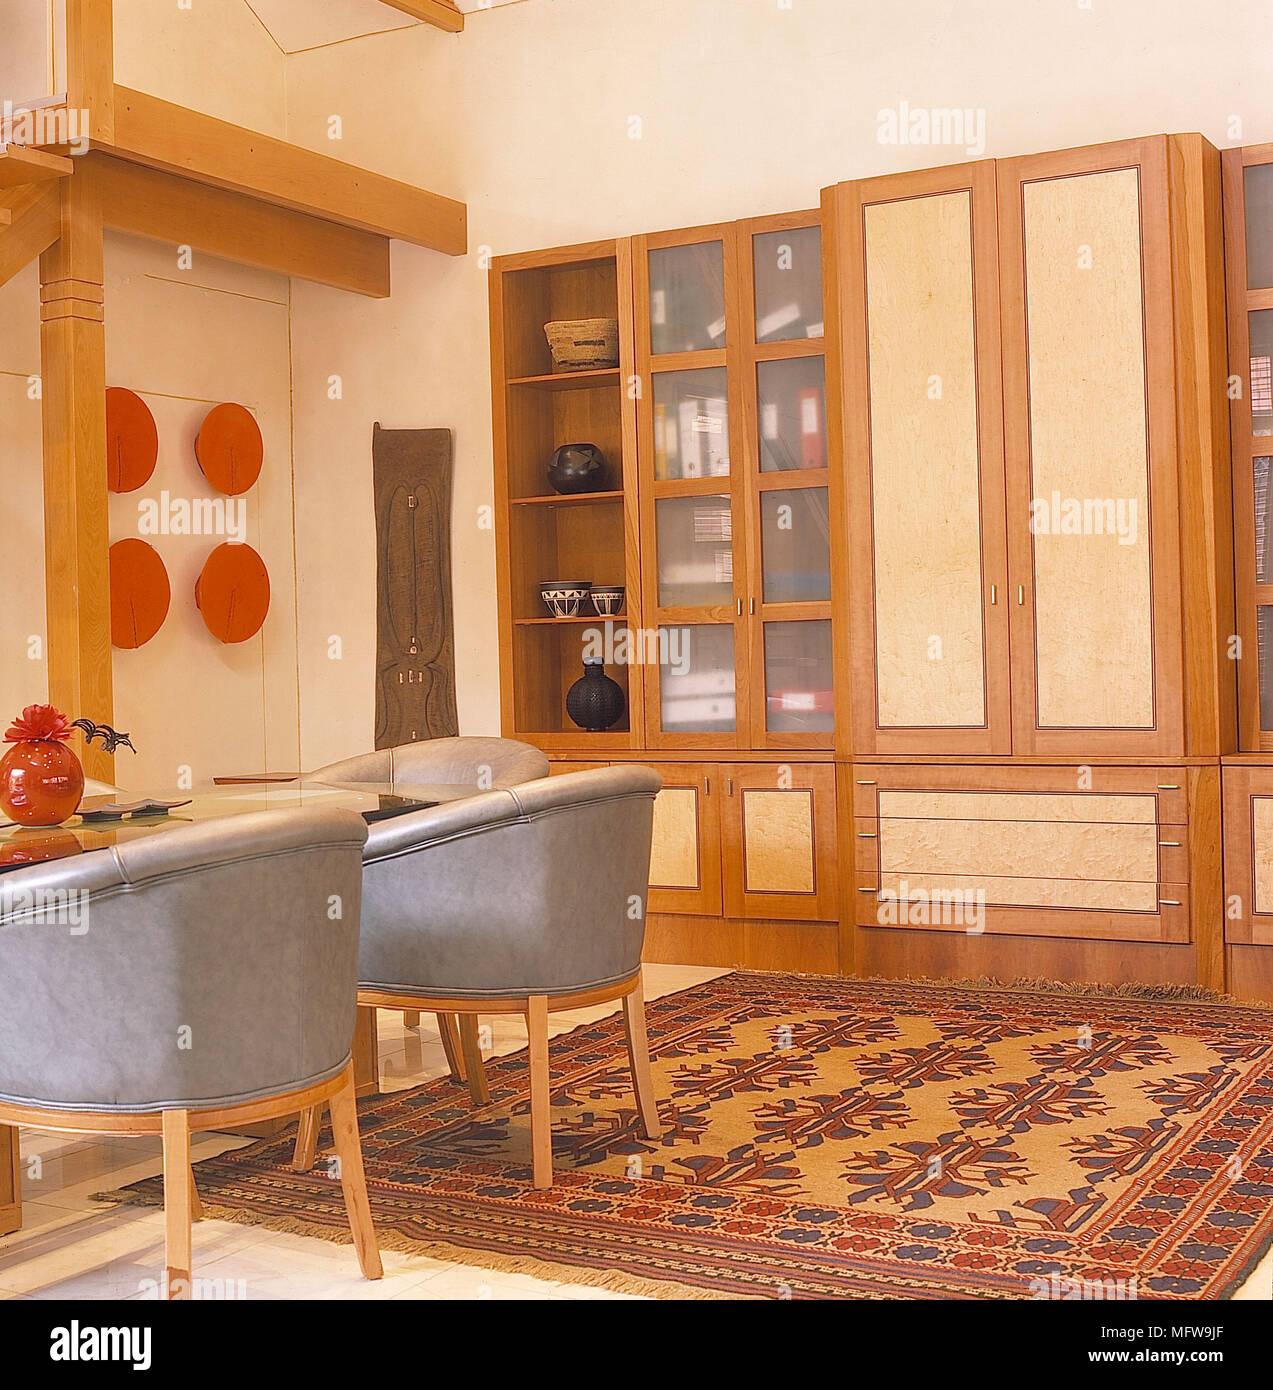 Ledersthle grau beautiful braun mit stuhle vintage for Weisse lederstuhle